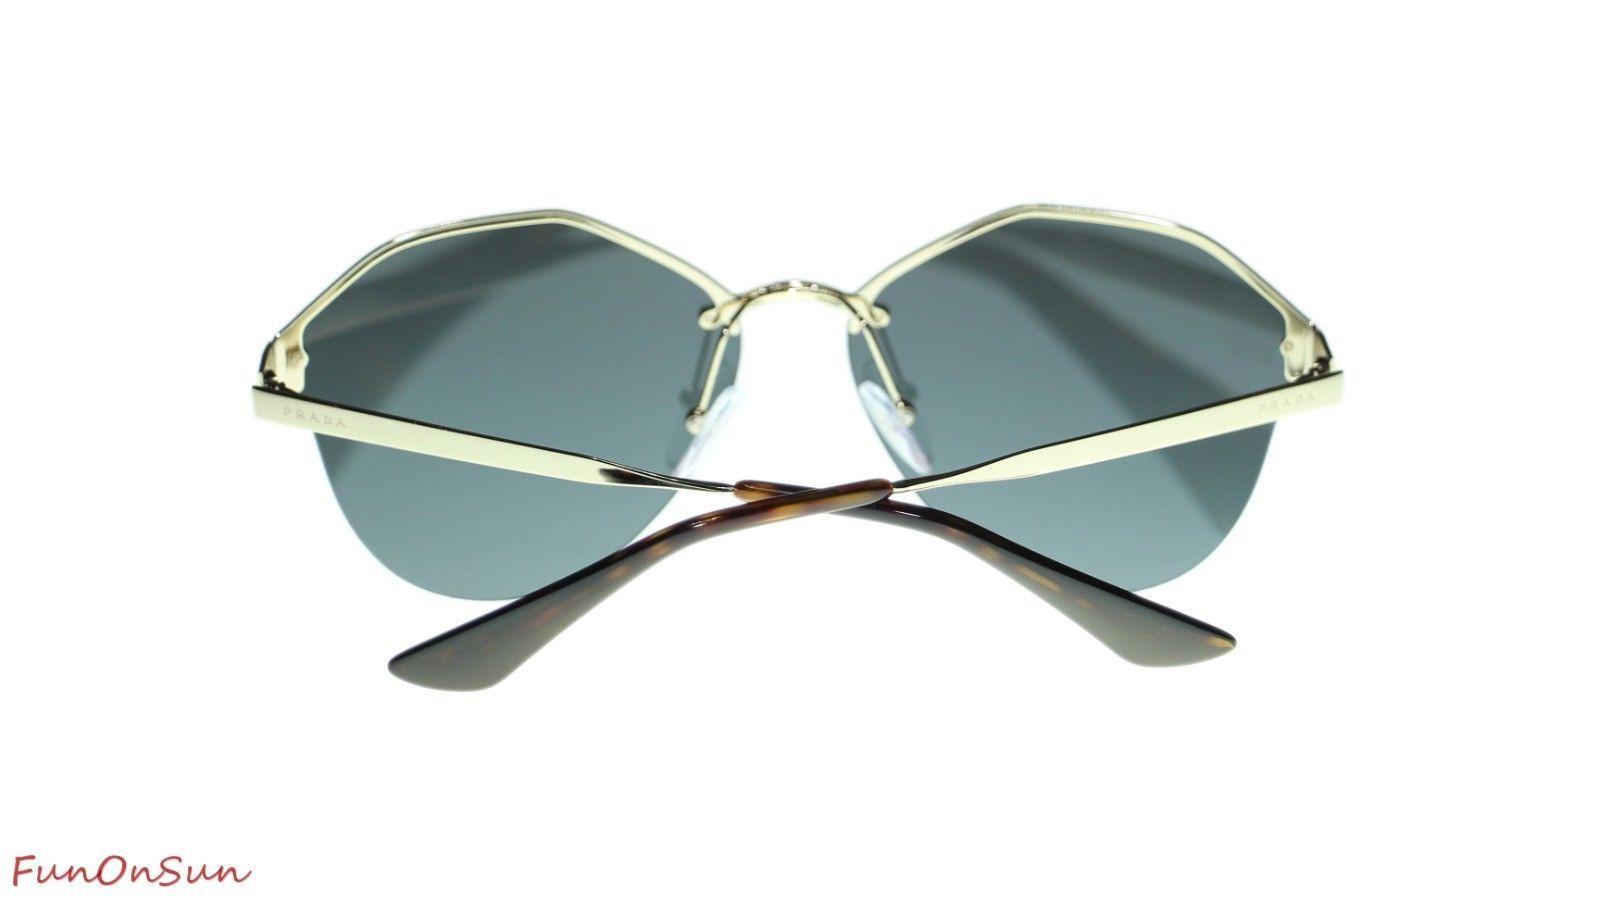 2fc84ae5c95 Prada Women Sunglasses PR64TS SVN4L0 Pale Gold Dark Grey Mirror Gold Lens  66mm